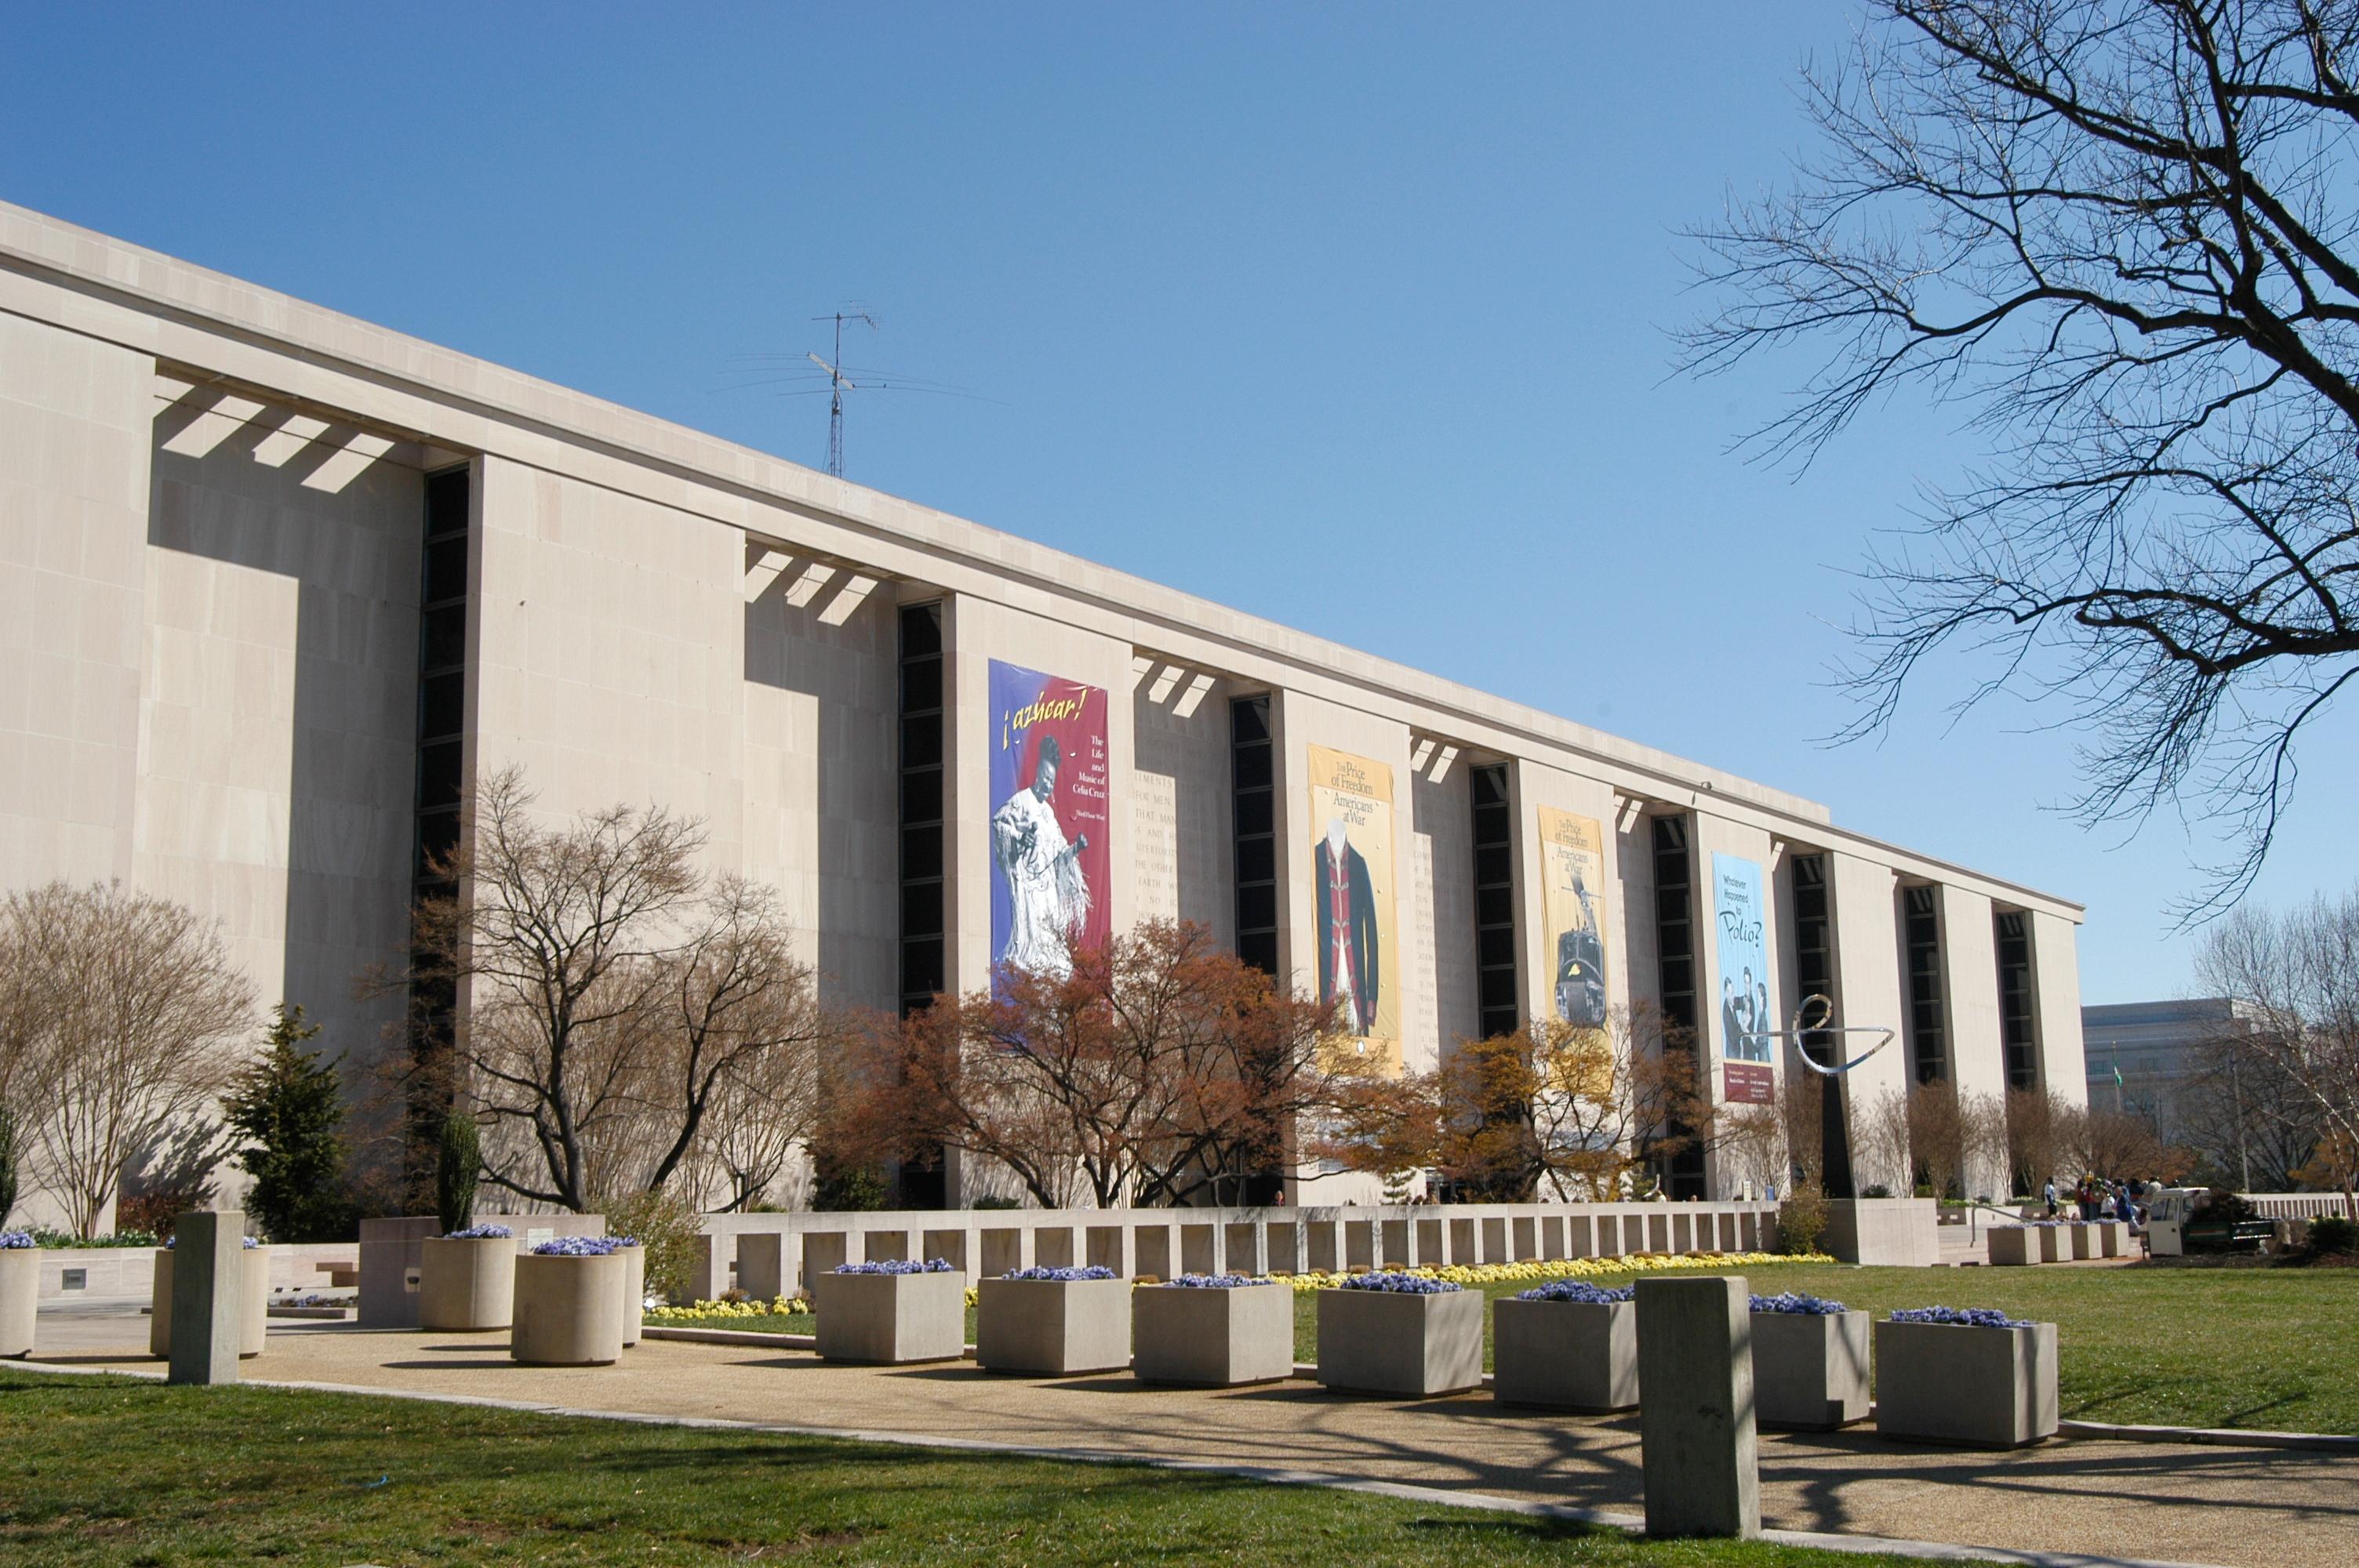 Exploring Washington, DC  Sojourner Travel